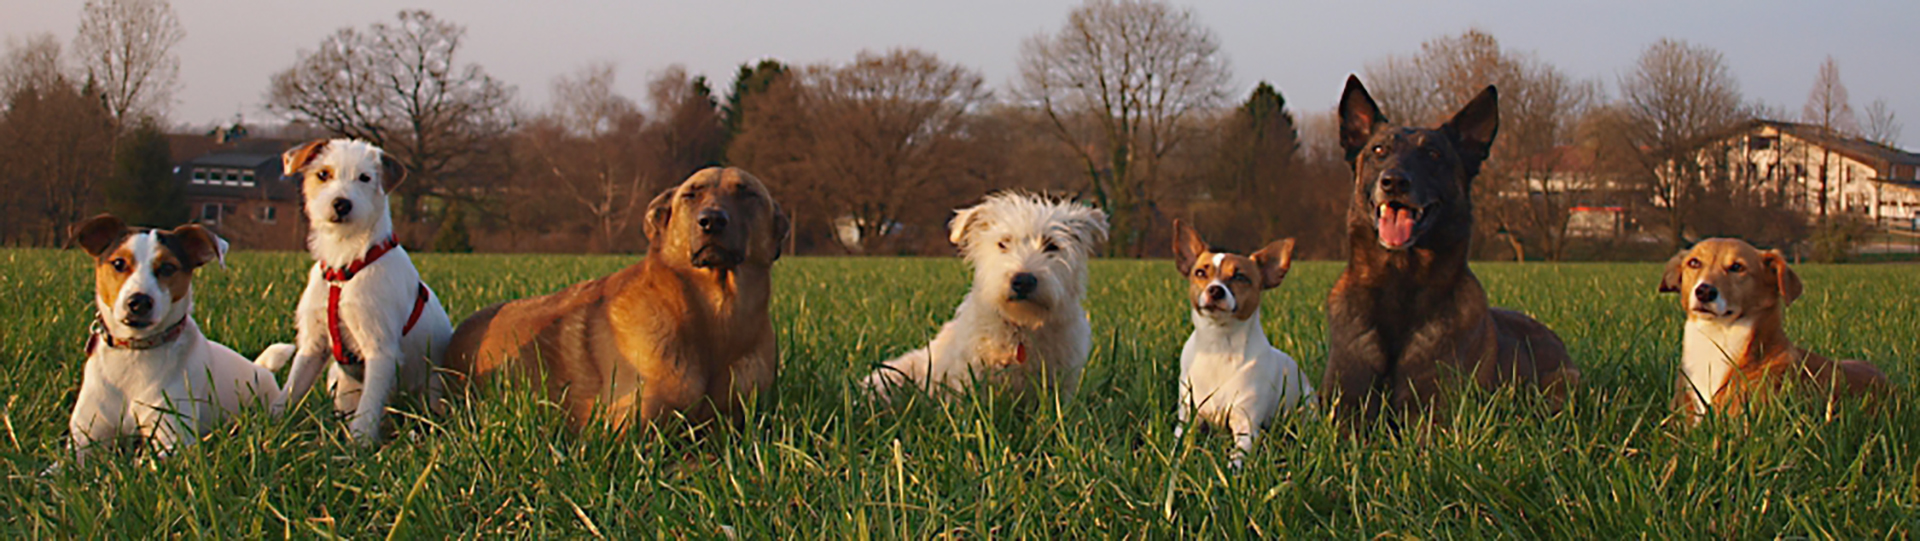 Hundeschule Wuppertal Düsseldorf